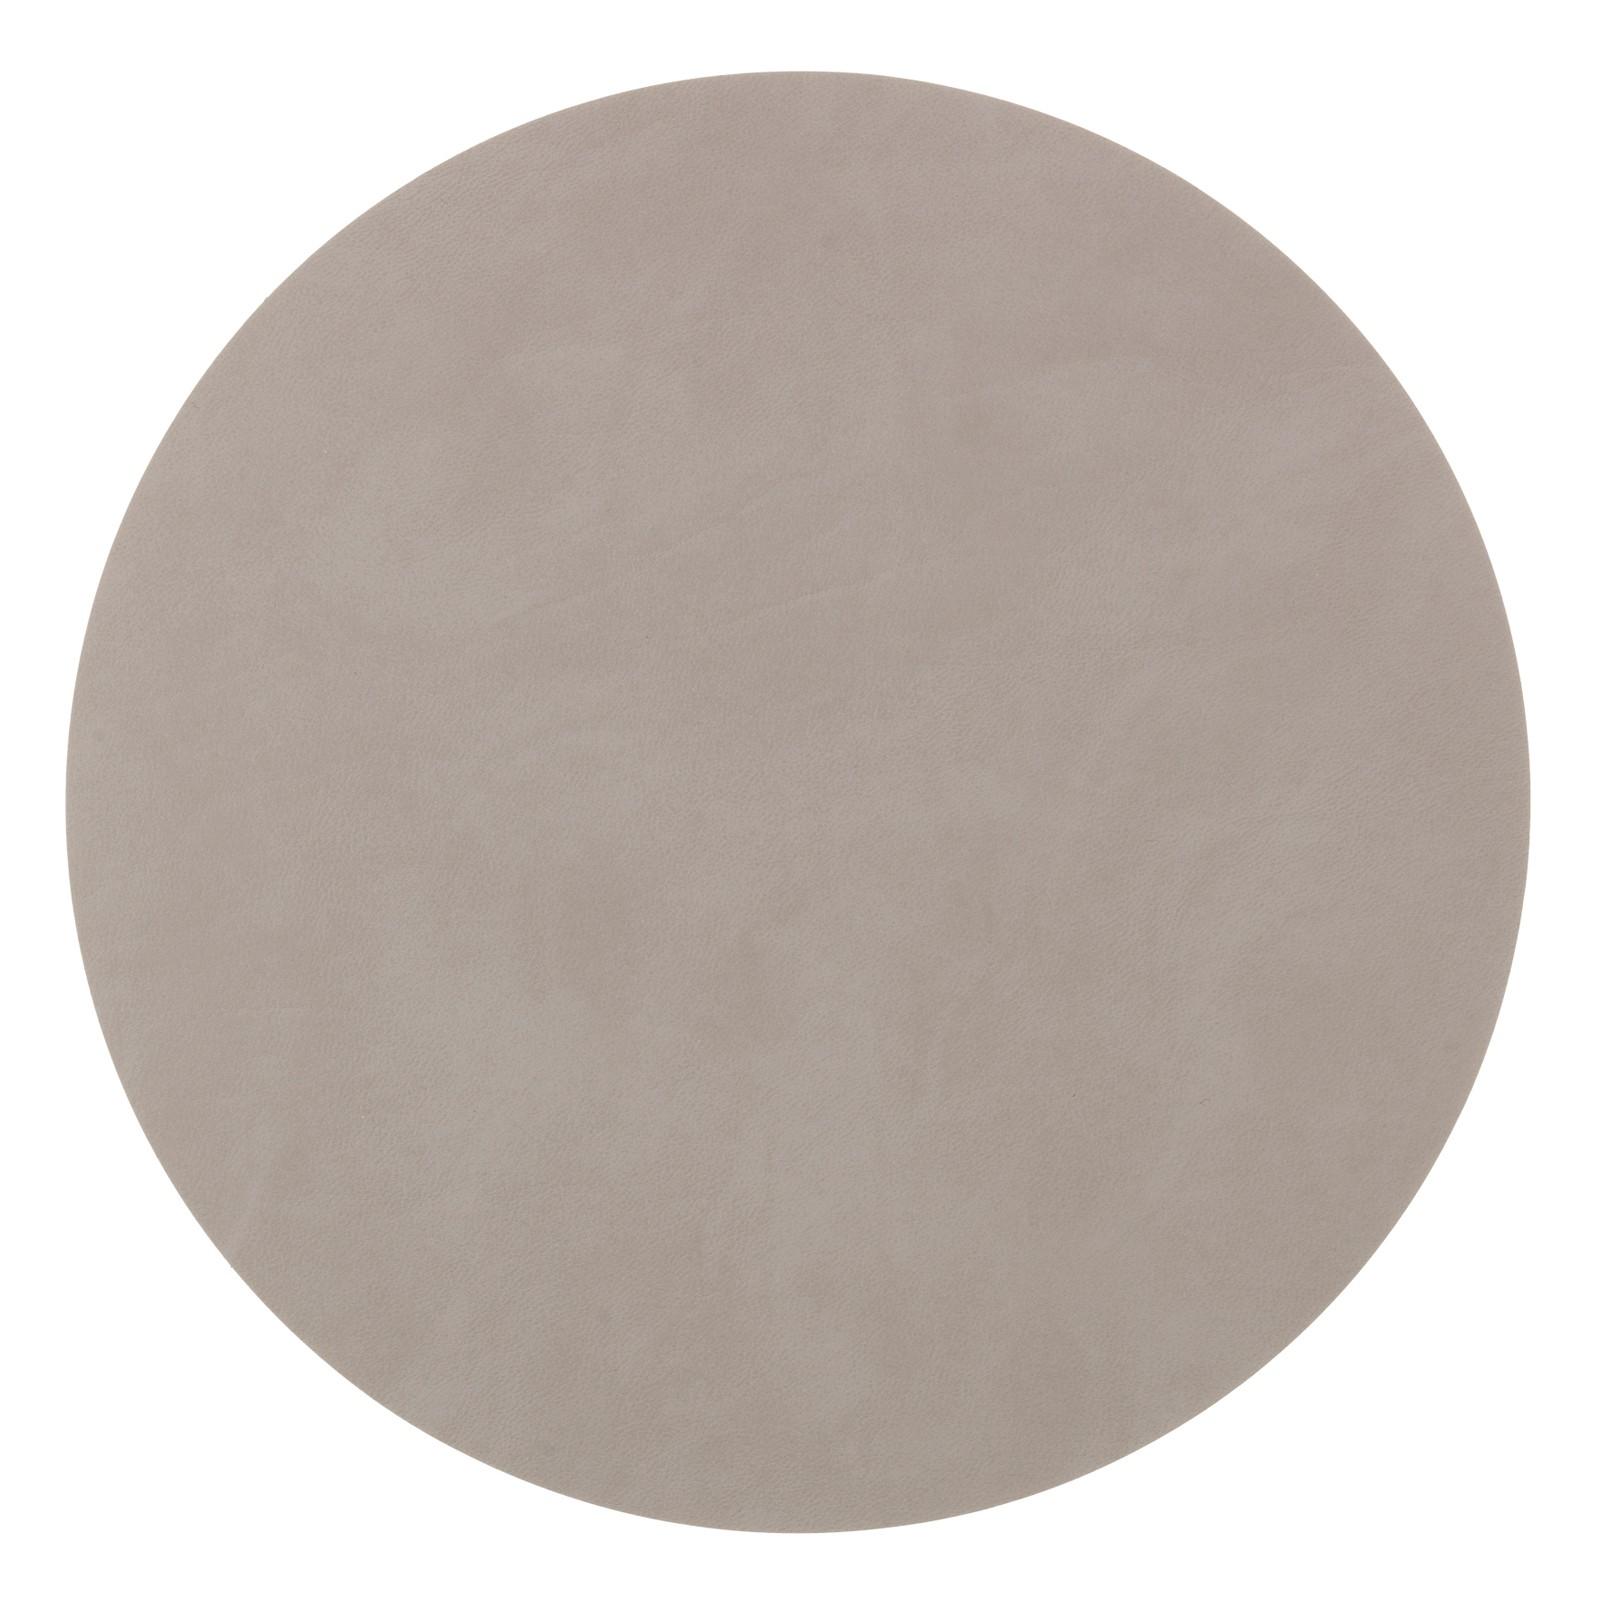 LindDNA Tischset Leder CIRCLE XL Durchmesser Ø 40 cm Nupo light grey